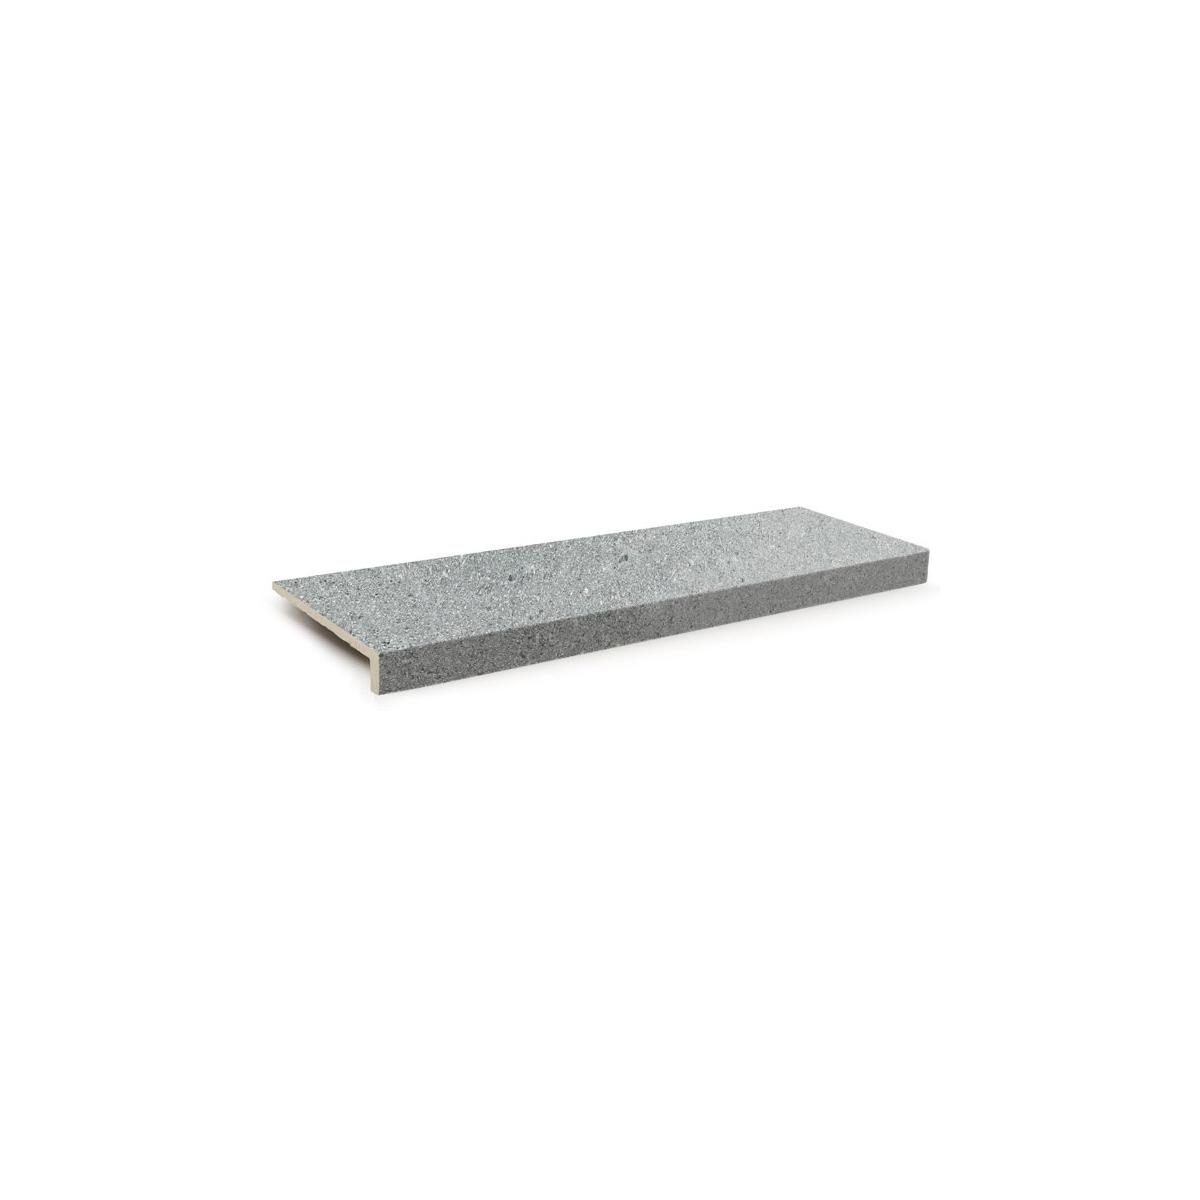 Borde de piscina en L Stromboli Silver 18x50x3,4